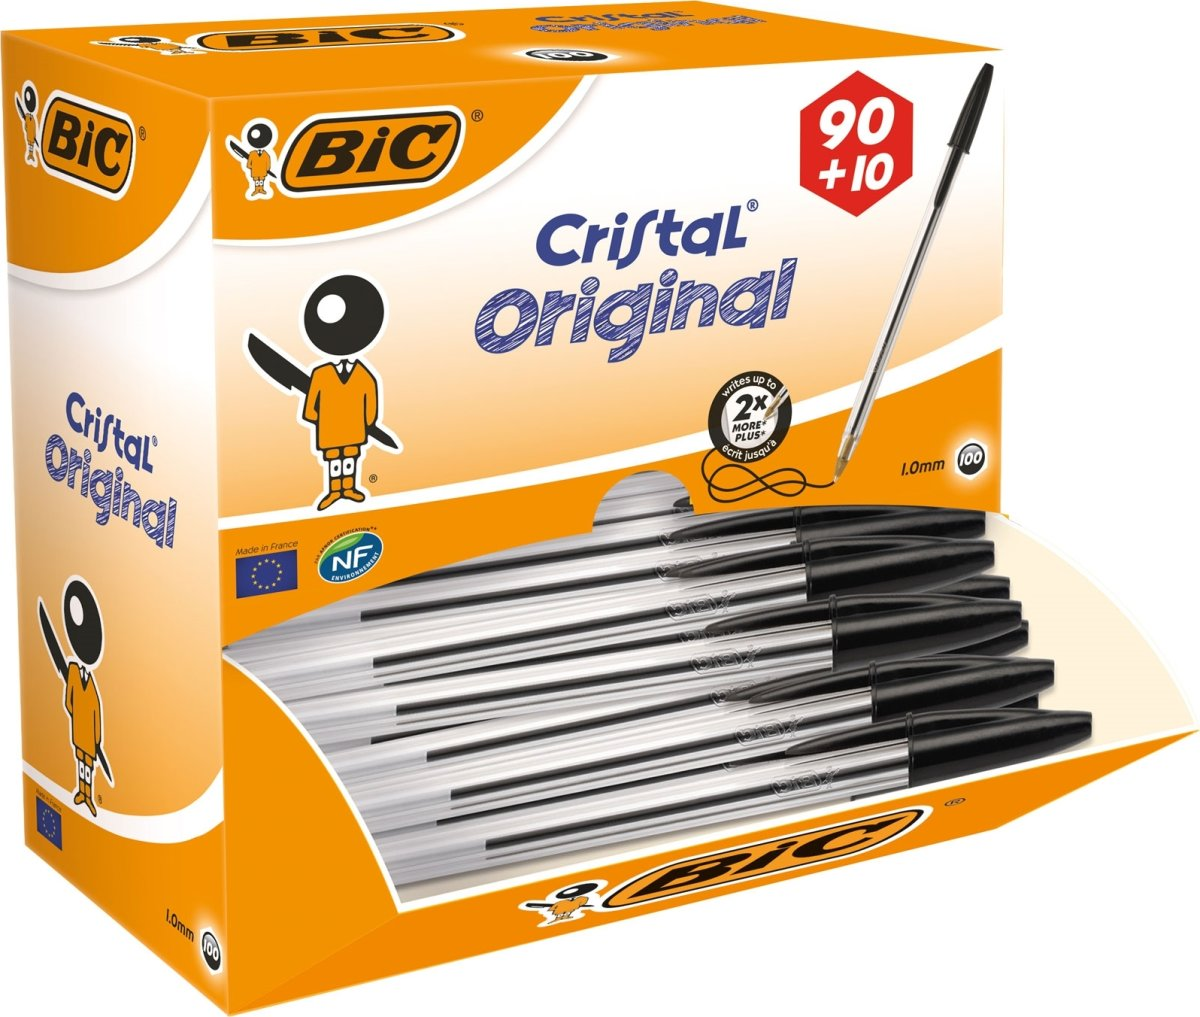 Bic Cristal kuglepen value pack, medium, sort